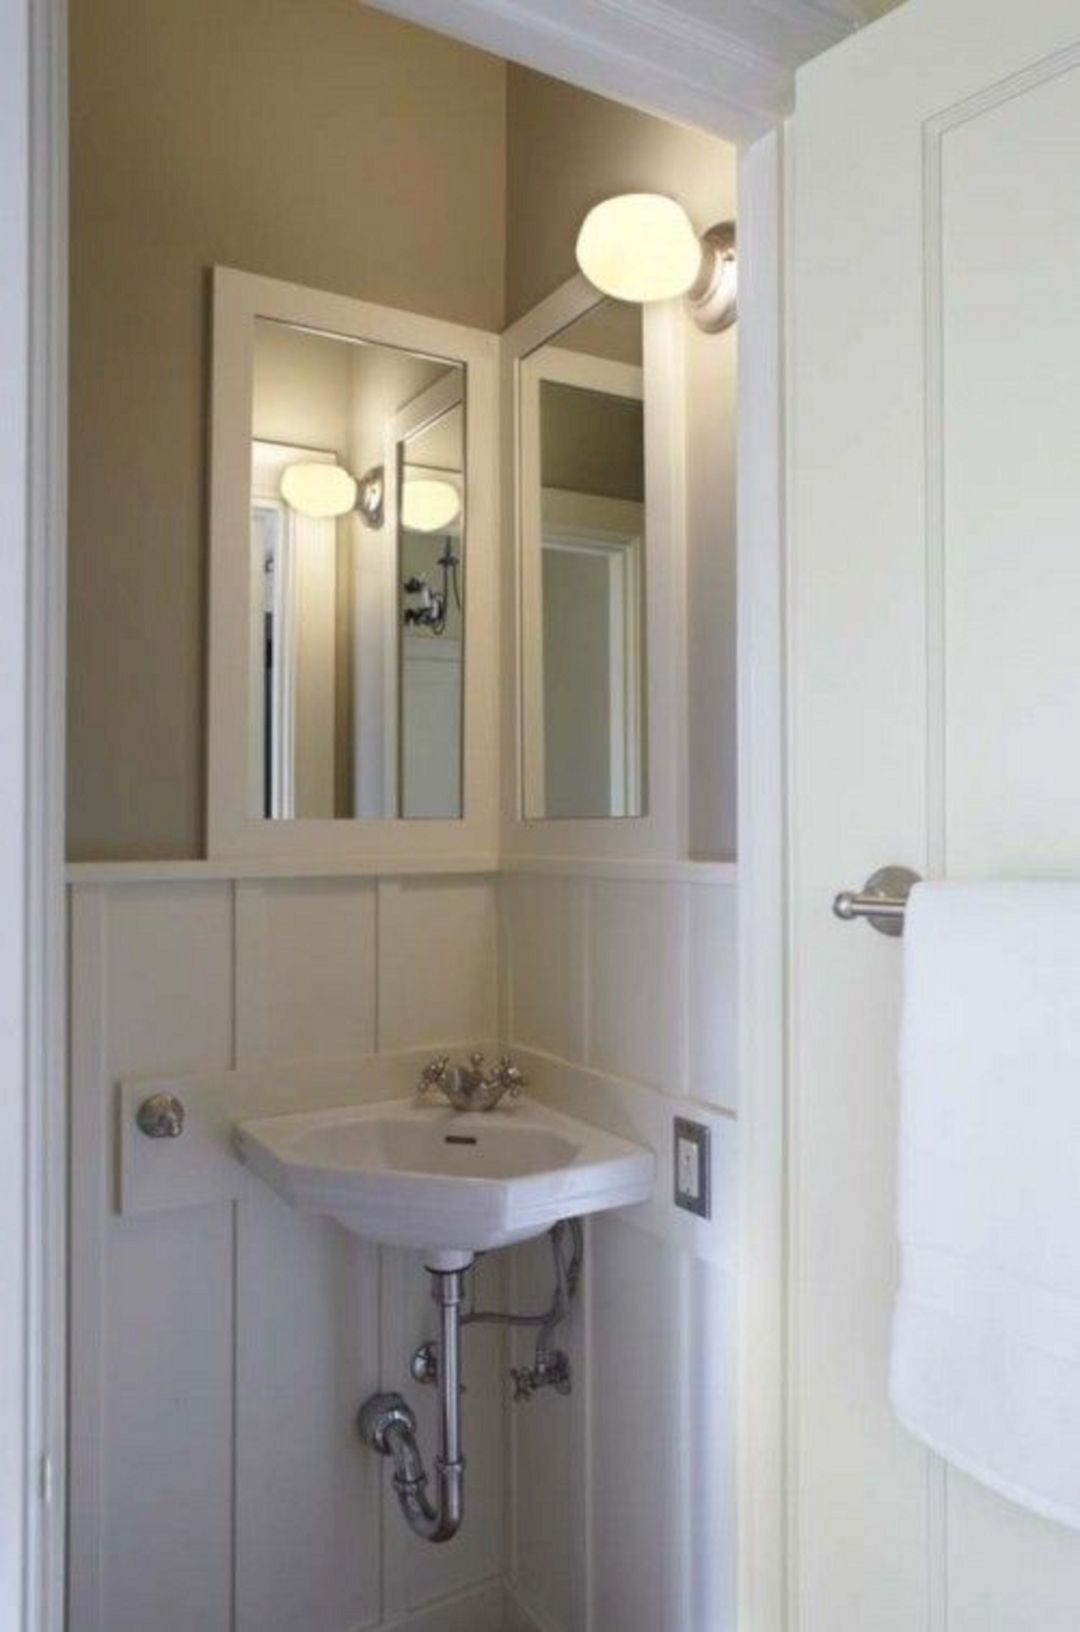 25 Lovely Corner Bathroom Sink Ideas For Small Bathroom Inspiration Freshouz Com Guest Bathroom Small Small Bathroom Inspiration Traditional Bathroom